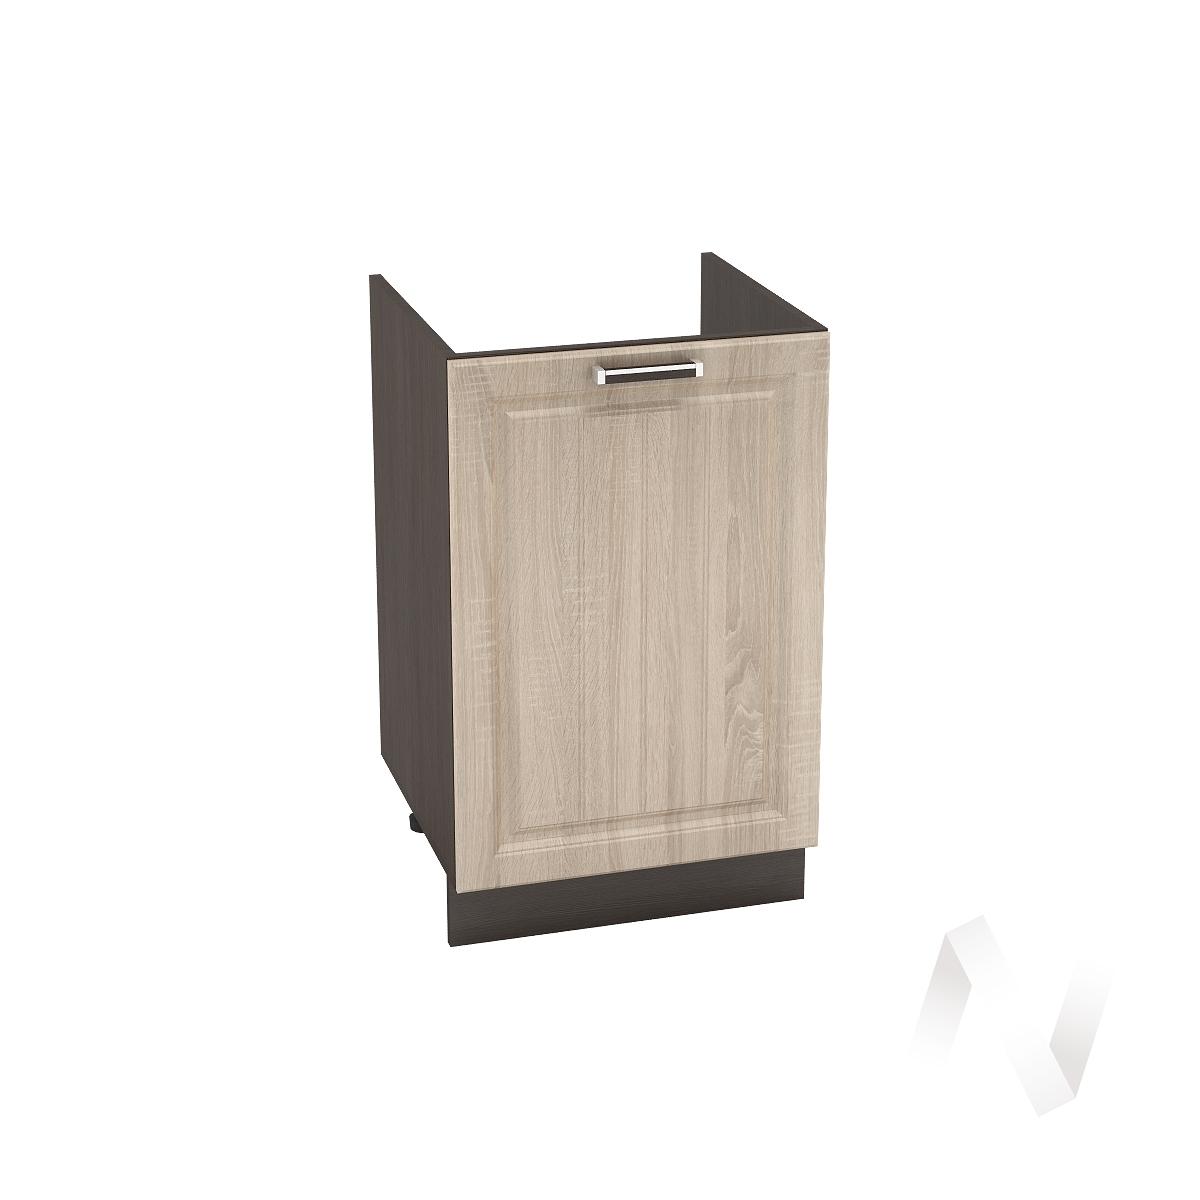 "Кухня ""Прага"": Шкаф нижний под мойку 500, ШНМ 500 (дуб сонома/корпус венге)"